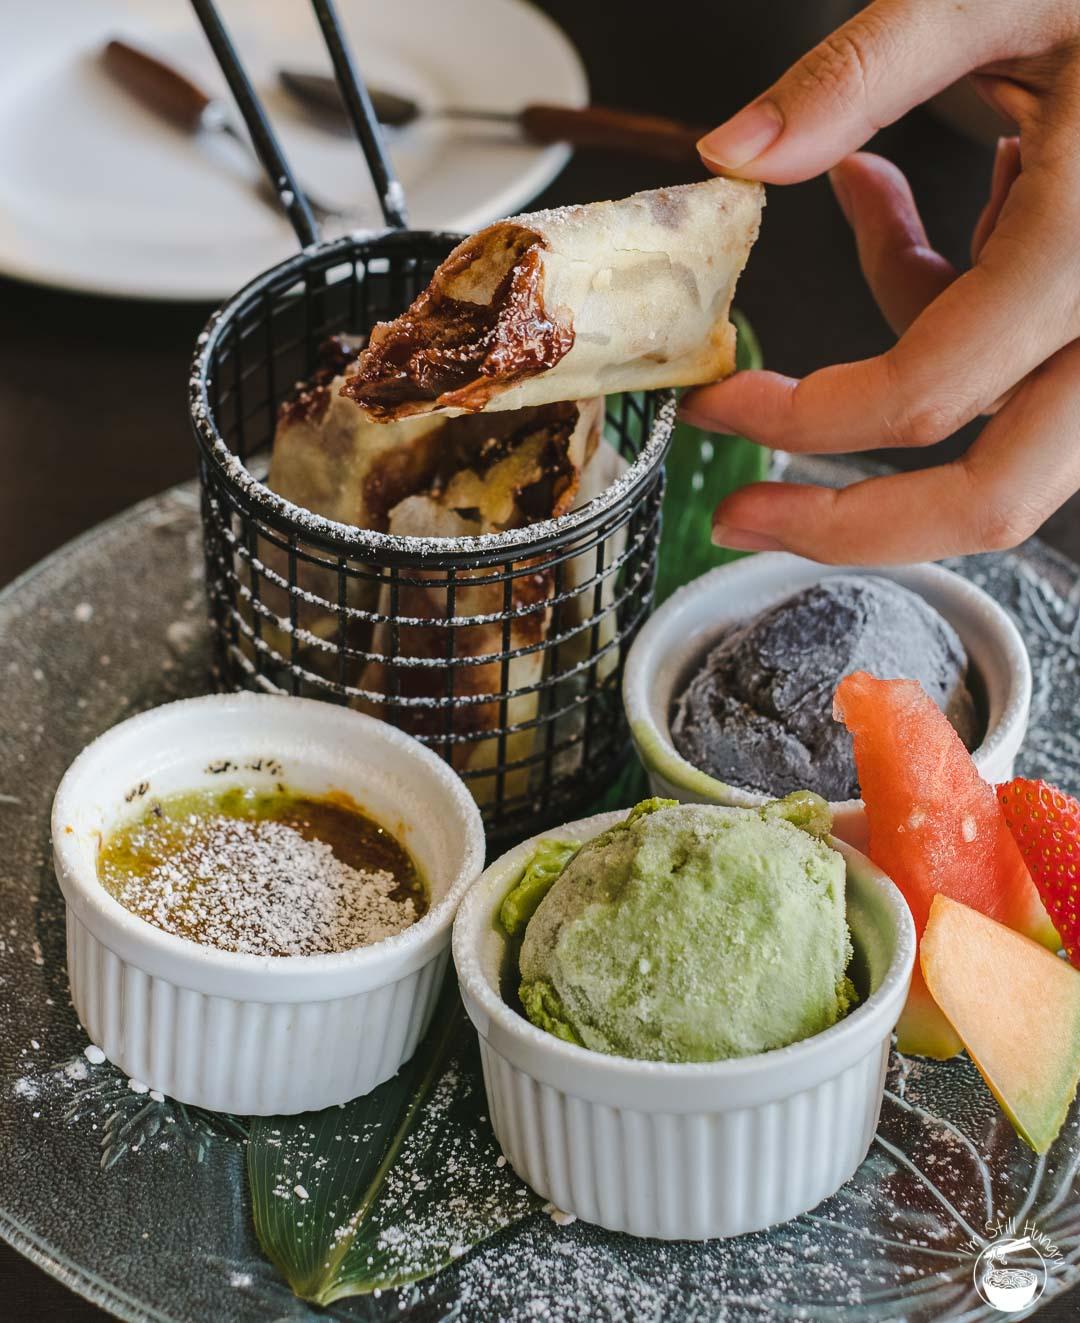 Toshiya Cremorne Custom dessert platter - matcha & black sesame ice cream, matcha creme brulee, Nutella spring rolls